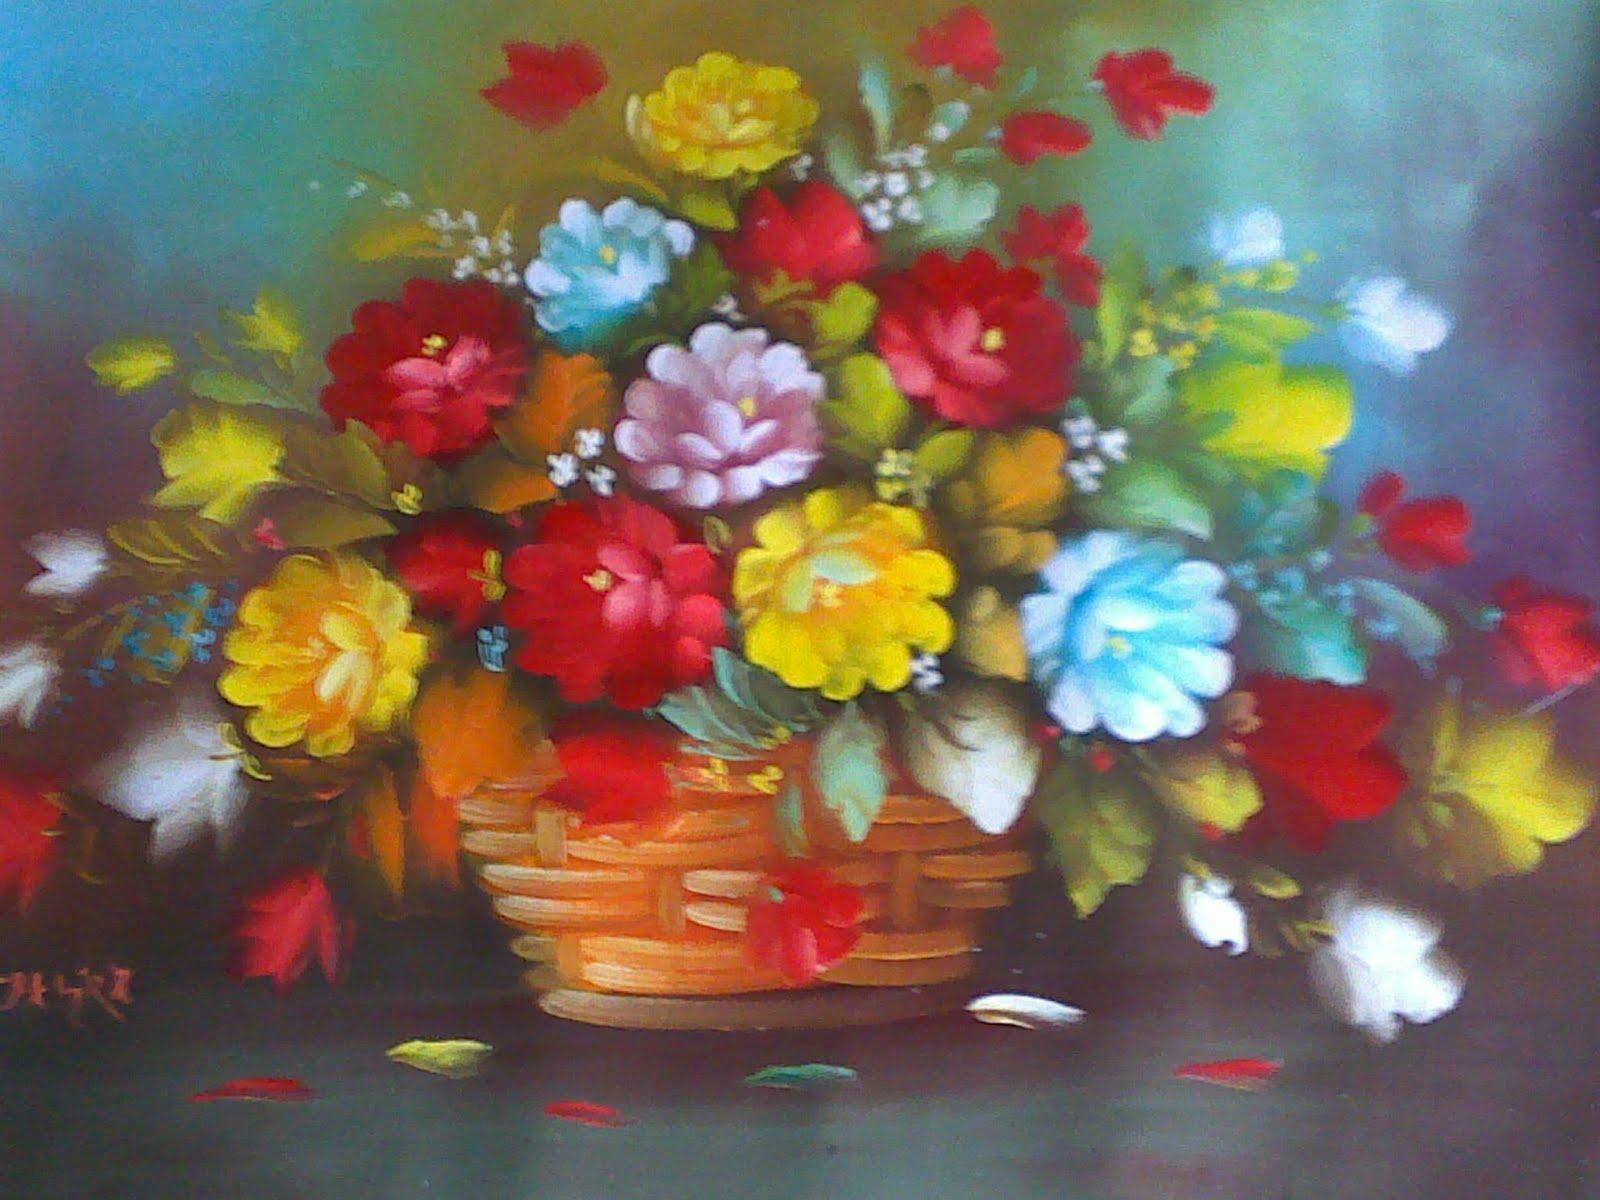 Bunga+ros,+ukrn+80x60.jpg harga Rp. 150.000 (tanpa bingkai & belum ...